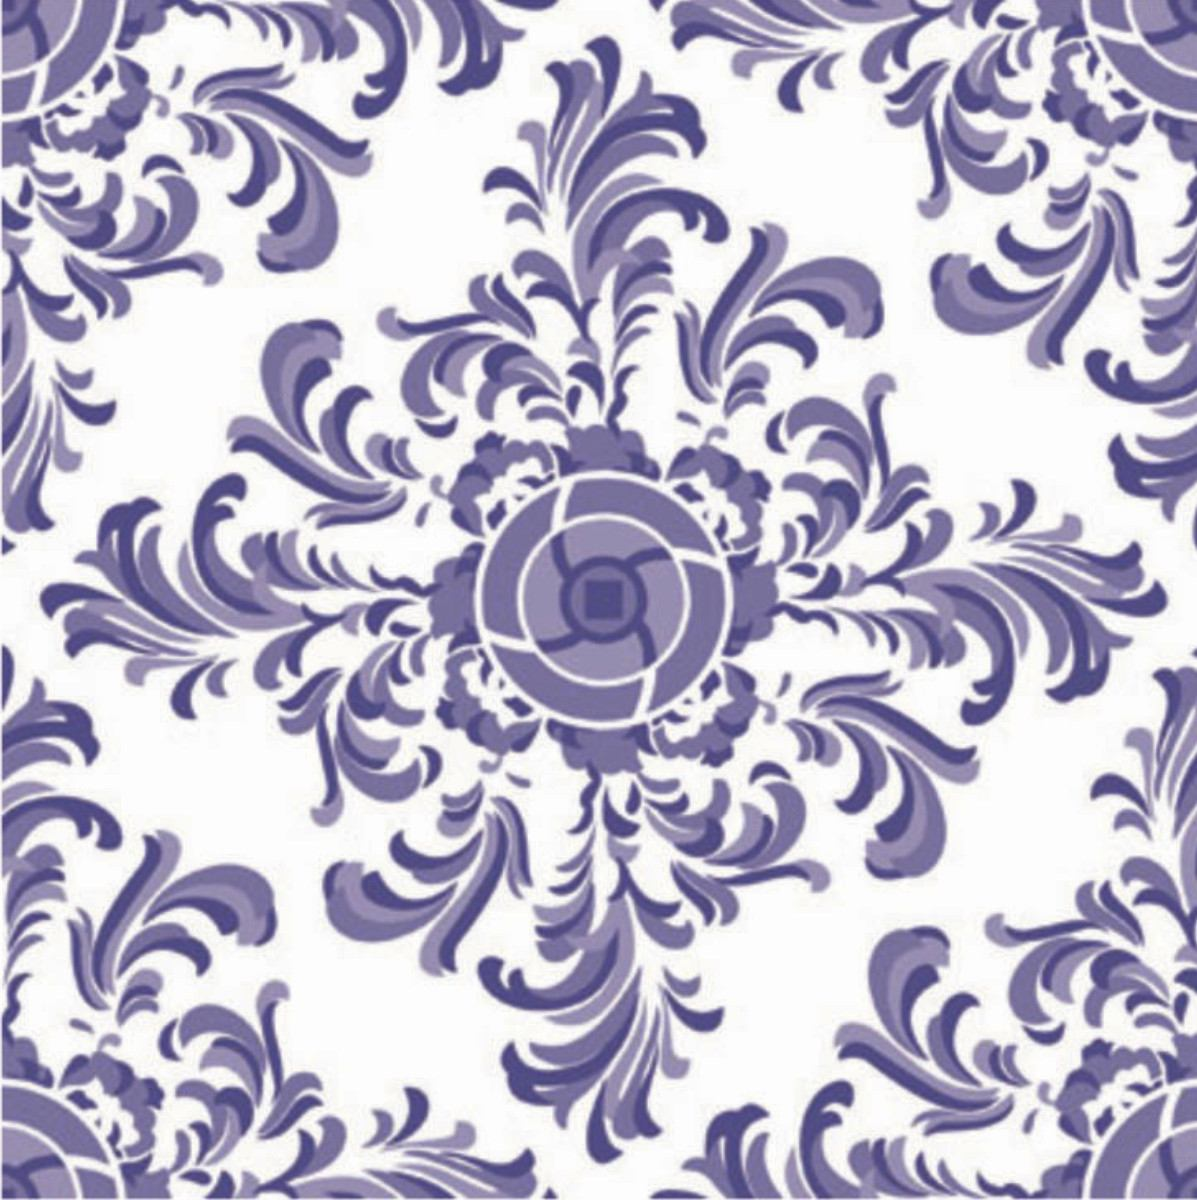 Adesivo Pastilha Azulejo Ladrilho Hidráulico Ou Parede 10cm R$ 1 58  #4E477F 1197x1200 Azulejo Banheiro Parede